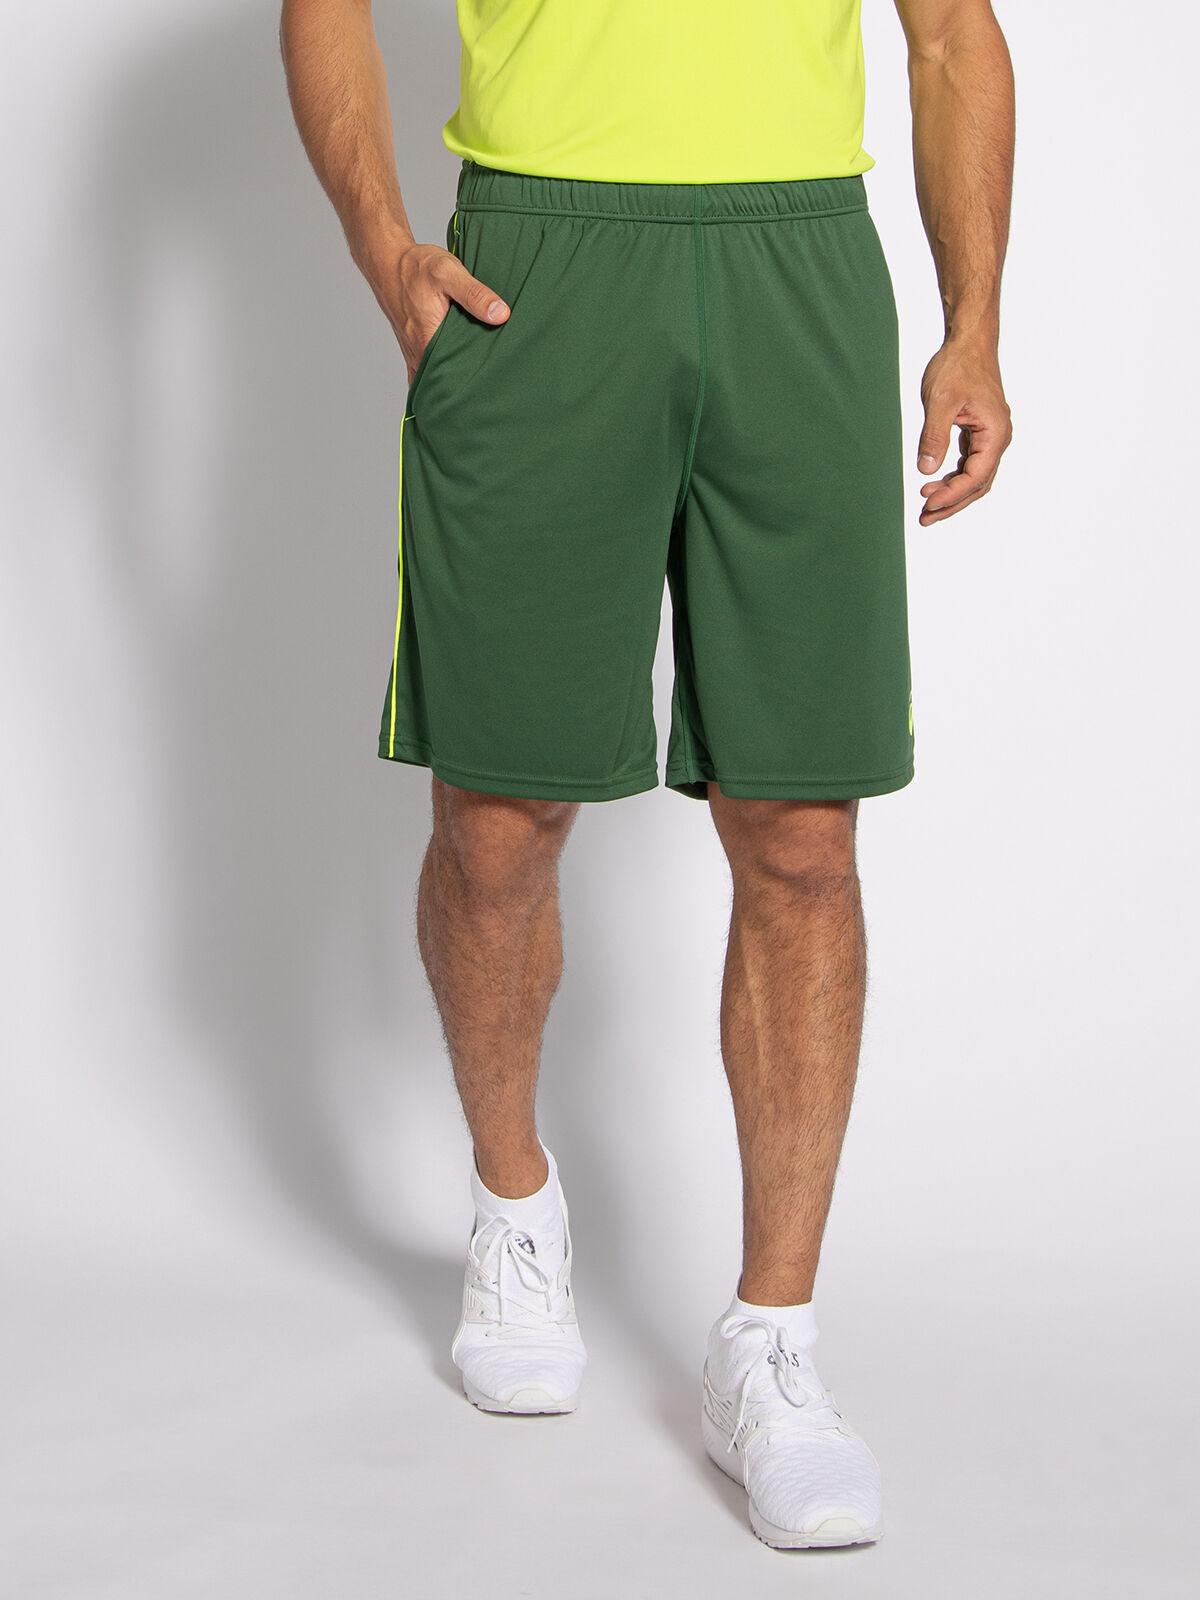 High-Performance Shorts